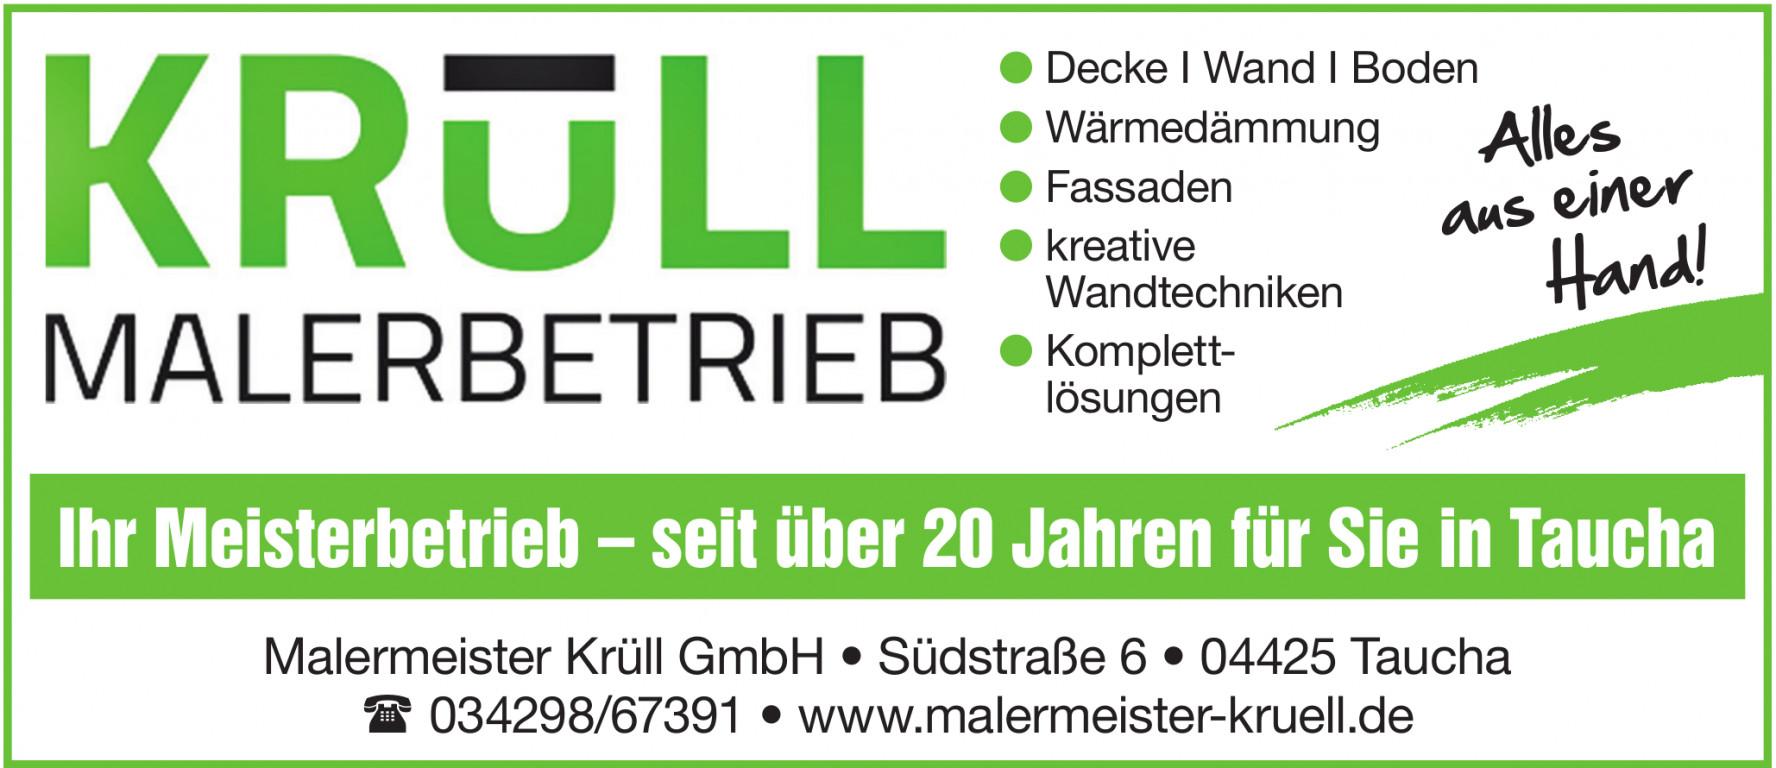 Malermeister Krüll GmbH